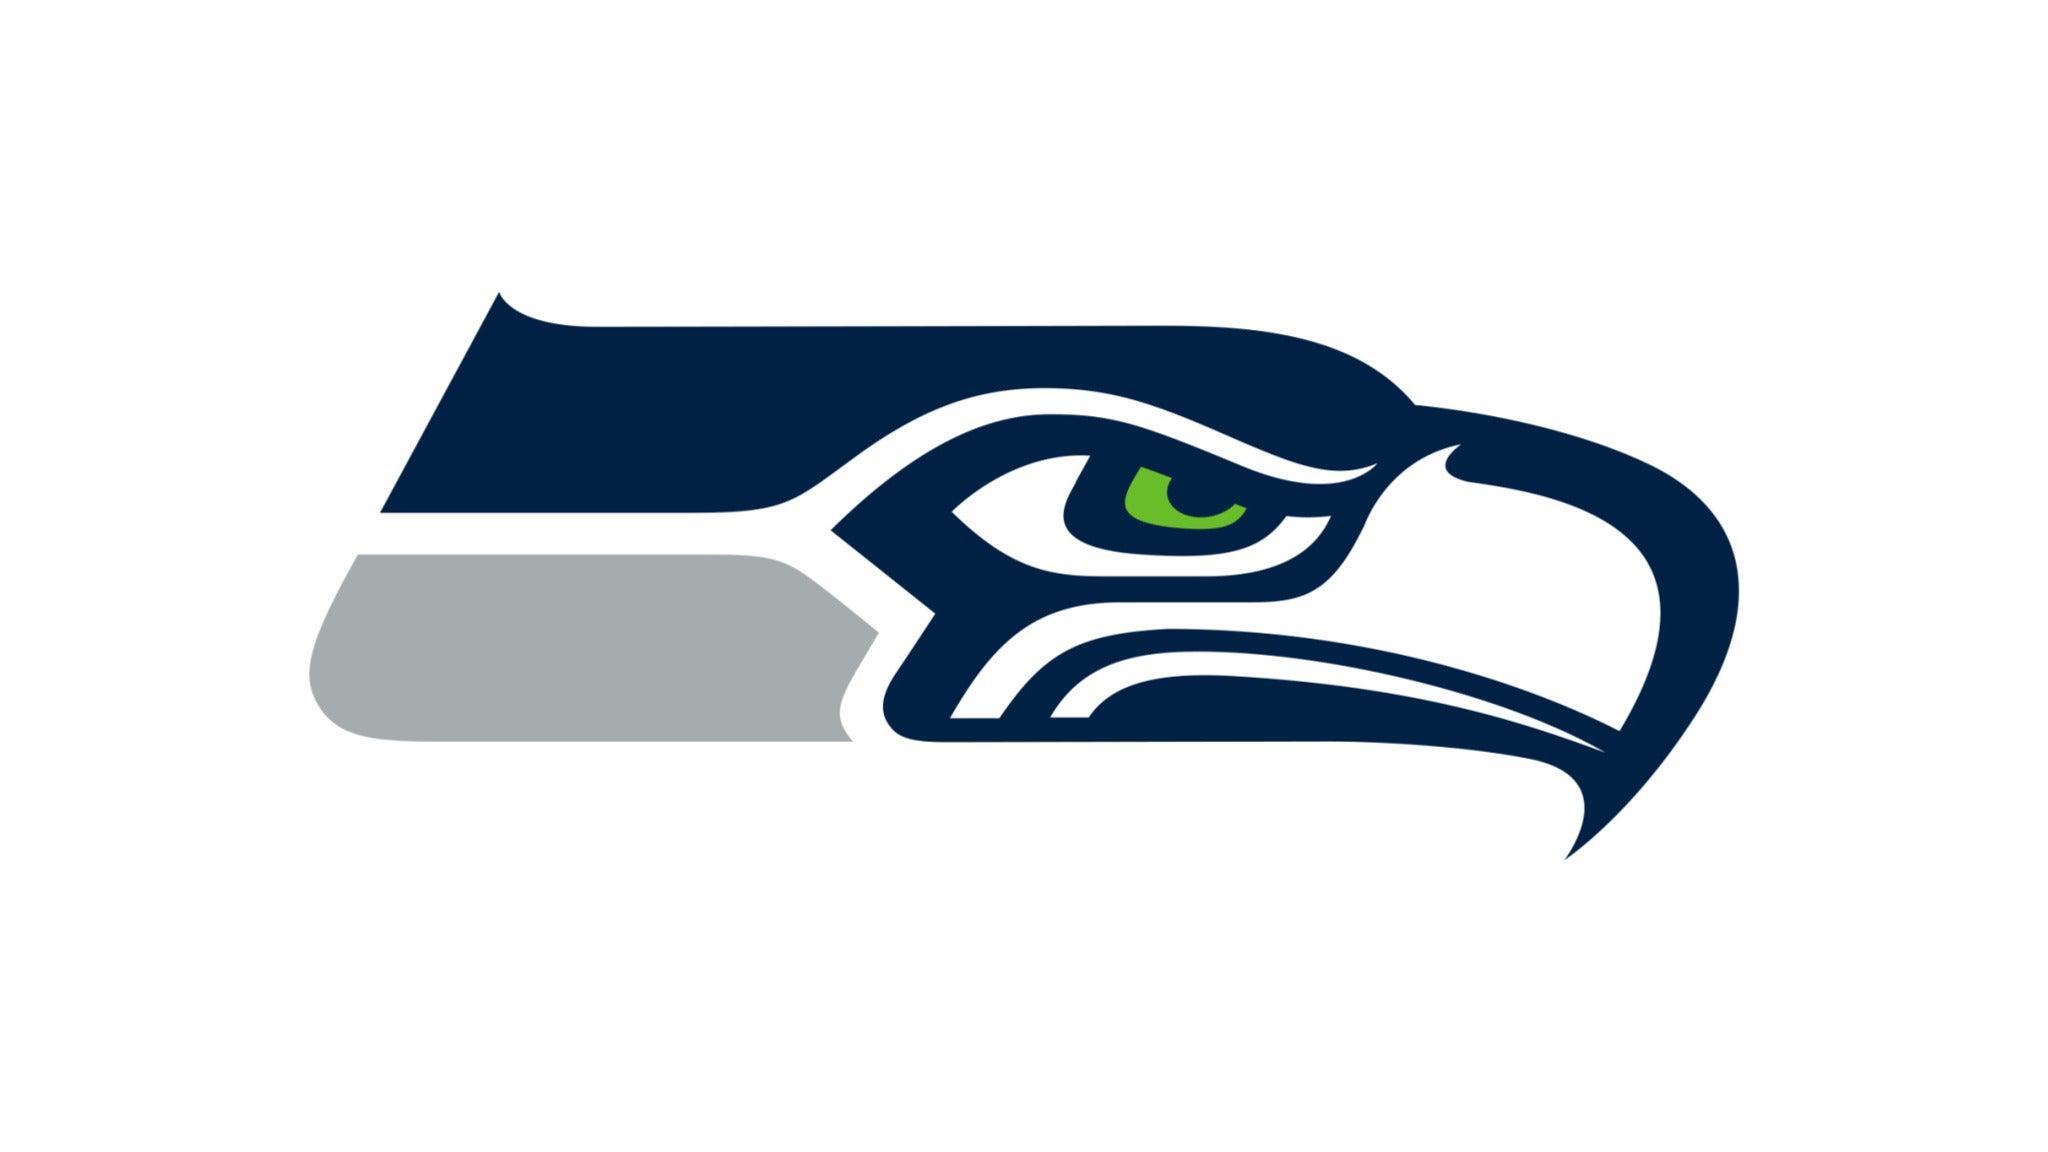 Seattle Seahawks vs. Los Angeles Rams at CenturyLink Field